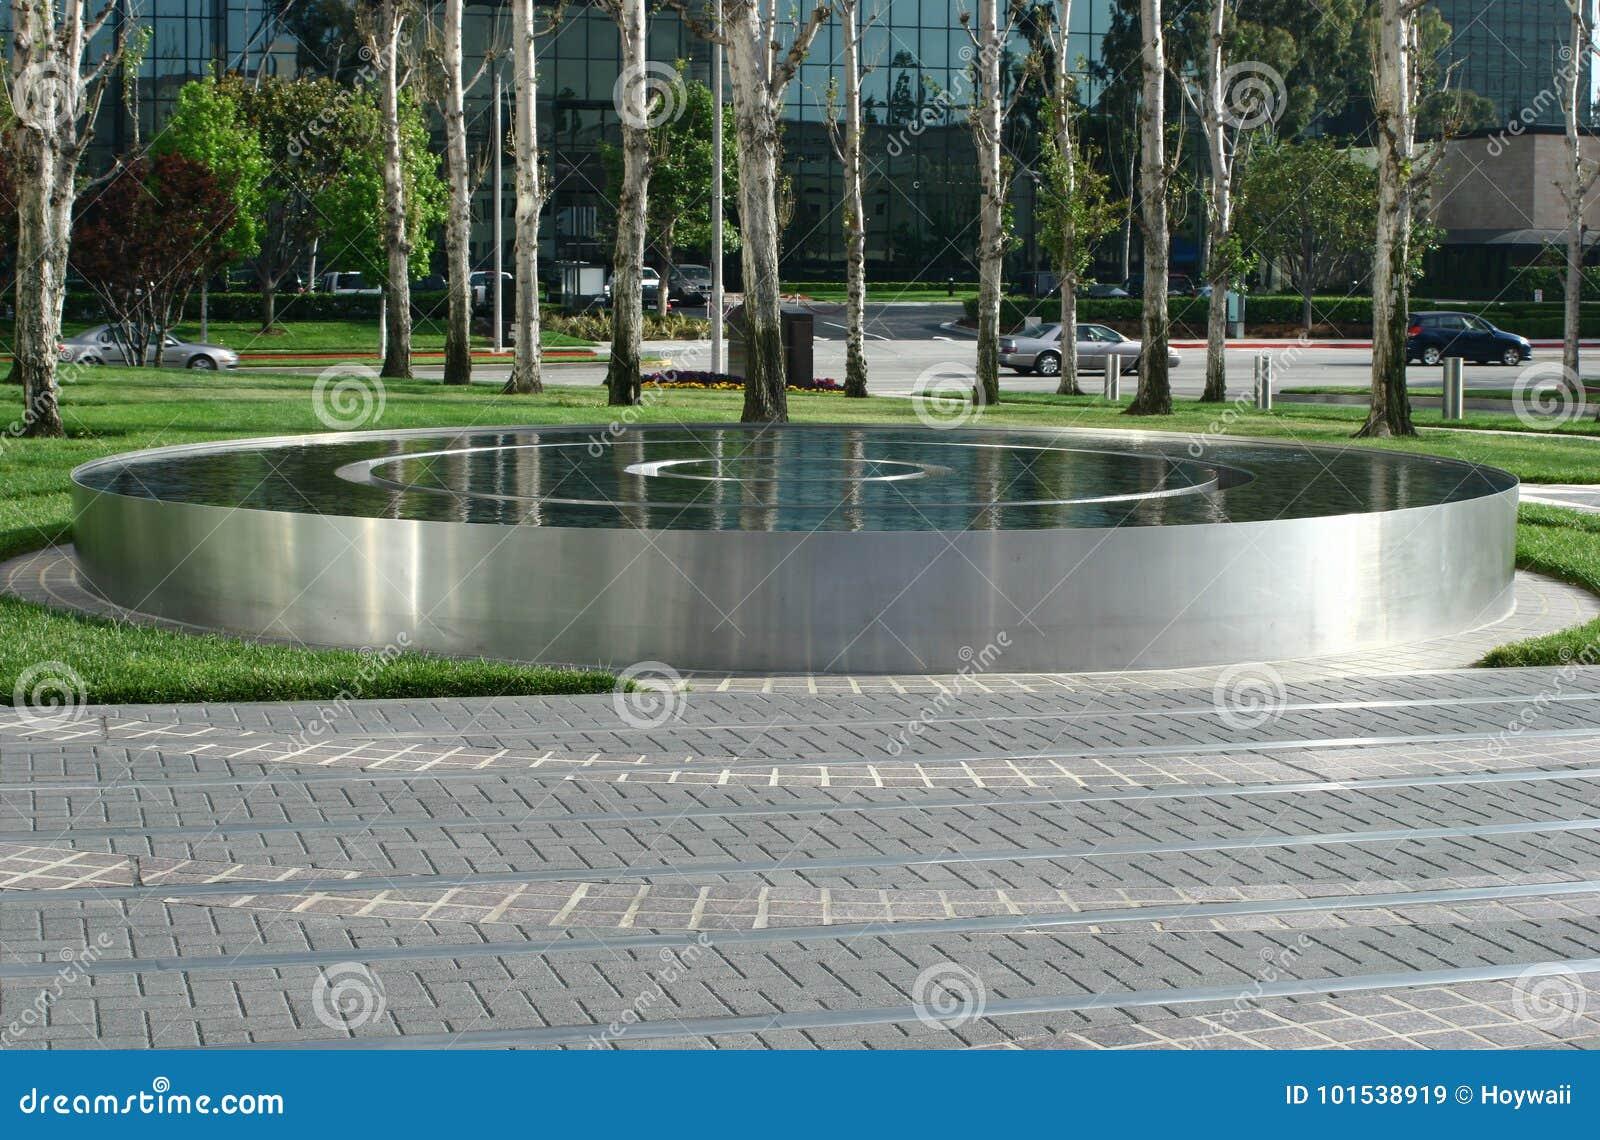 Circular Stainless Steel Reflecting Water Pool Editorial